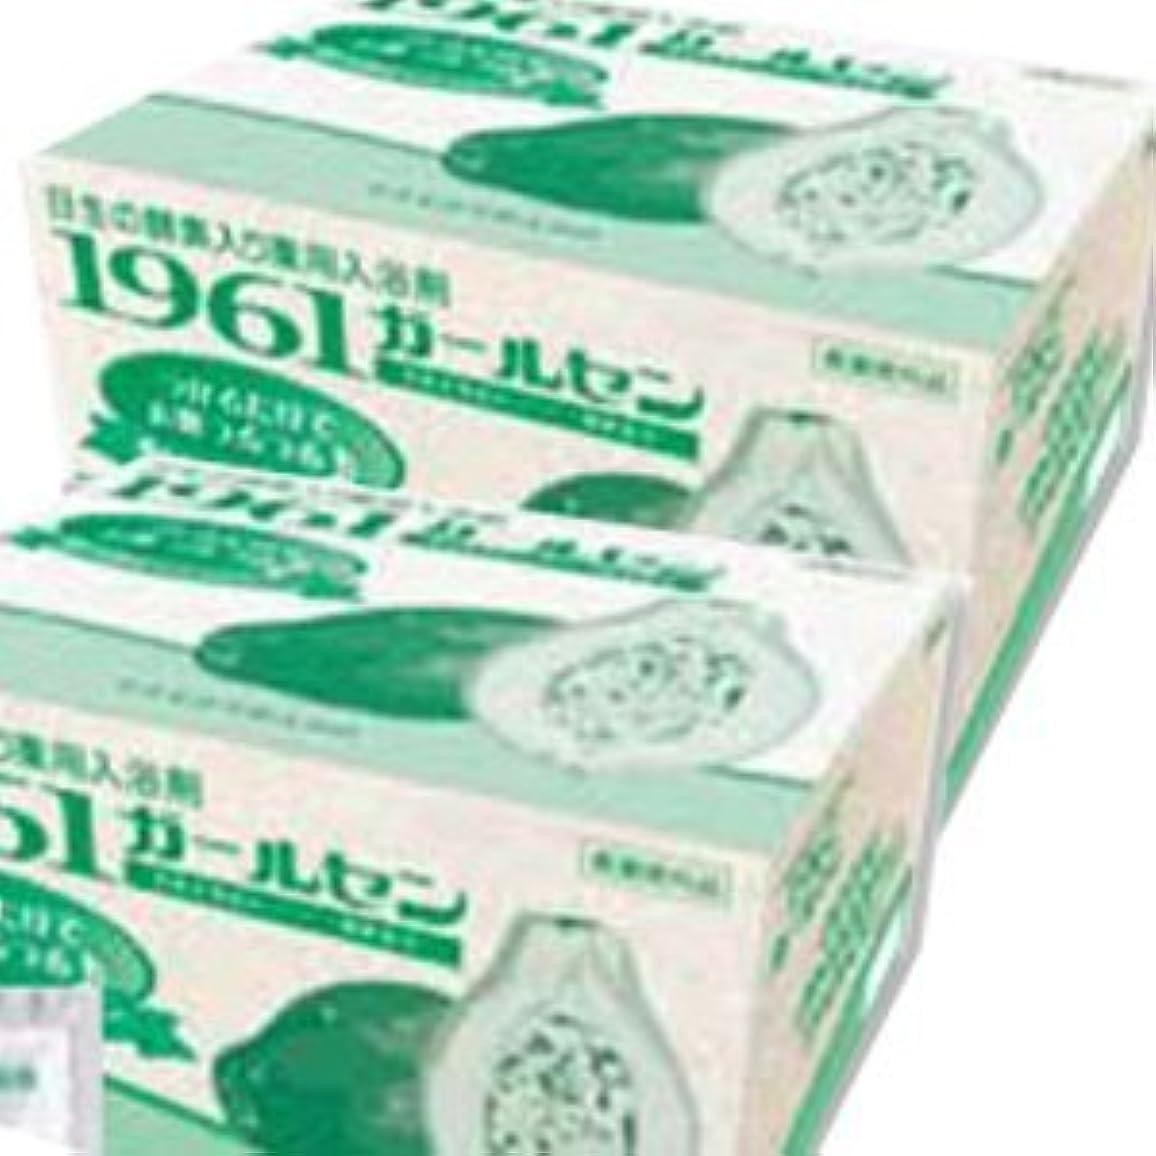 ロバ美人札入れ日本生化学 薬用入浴剤 1961ガールセン (20g×60包)×2箱 (医薬部外品)